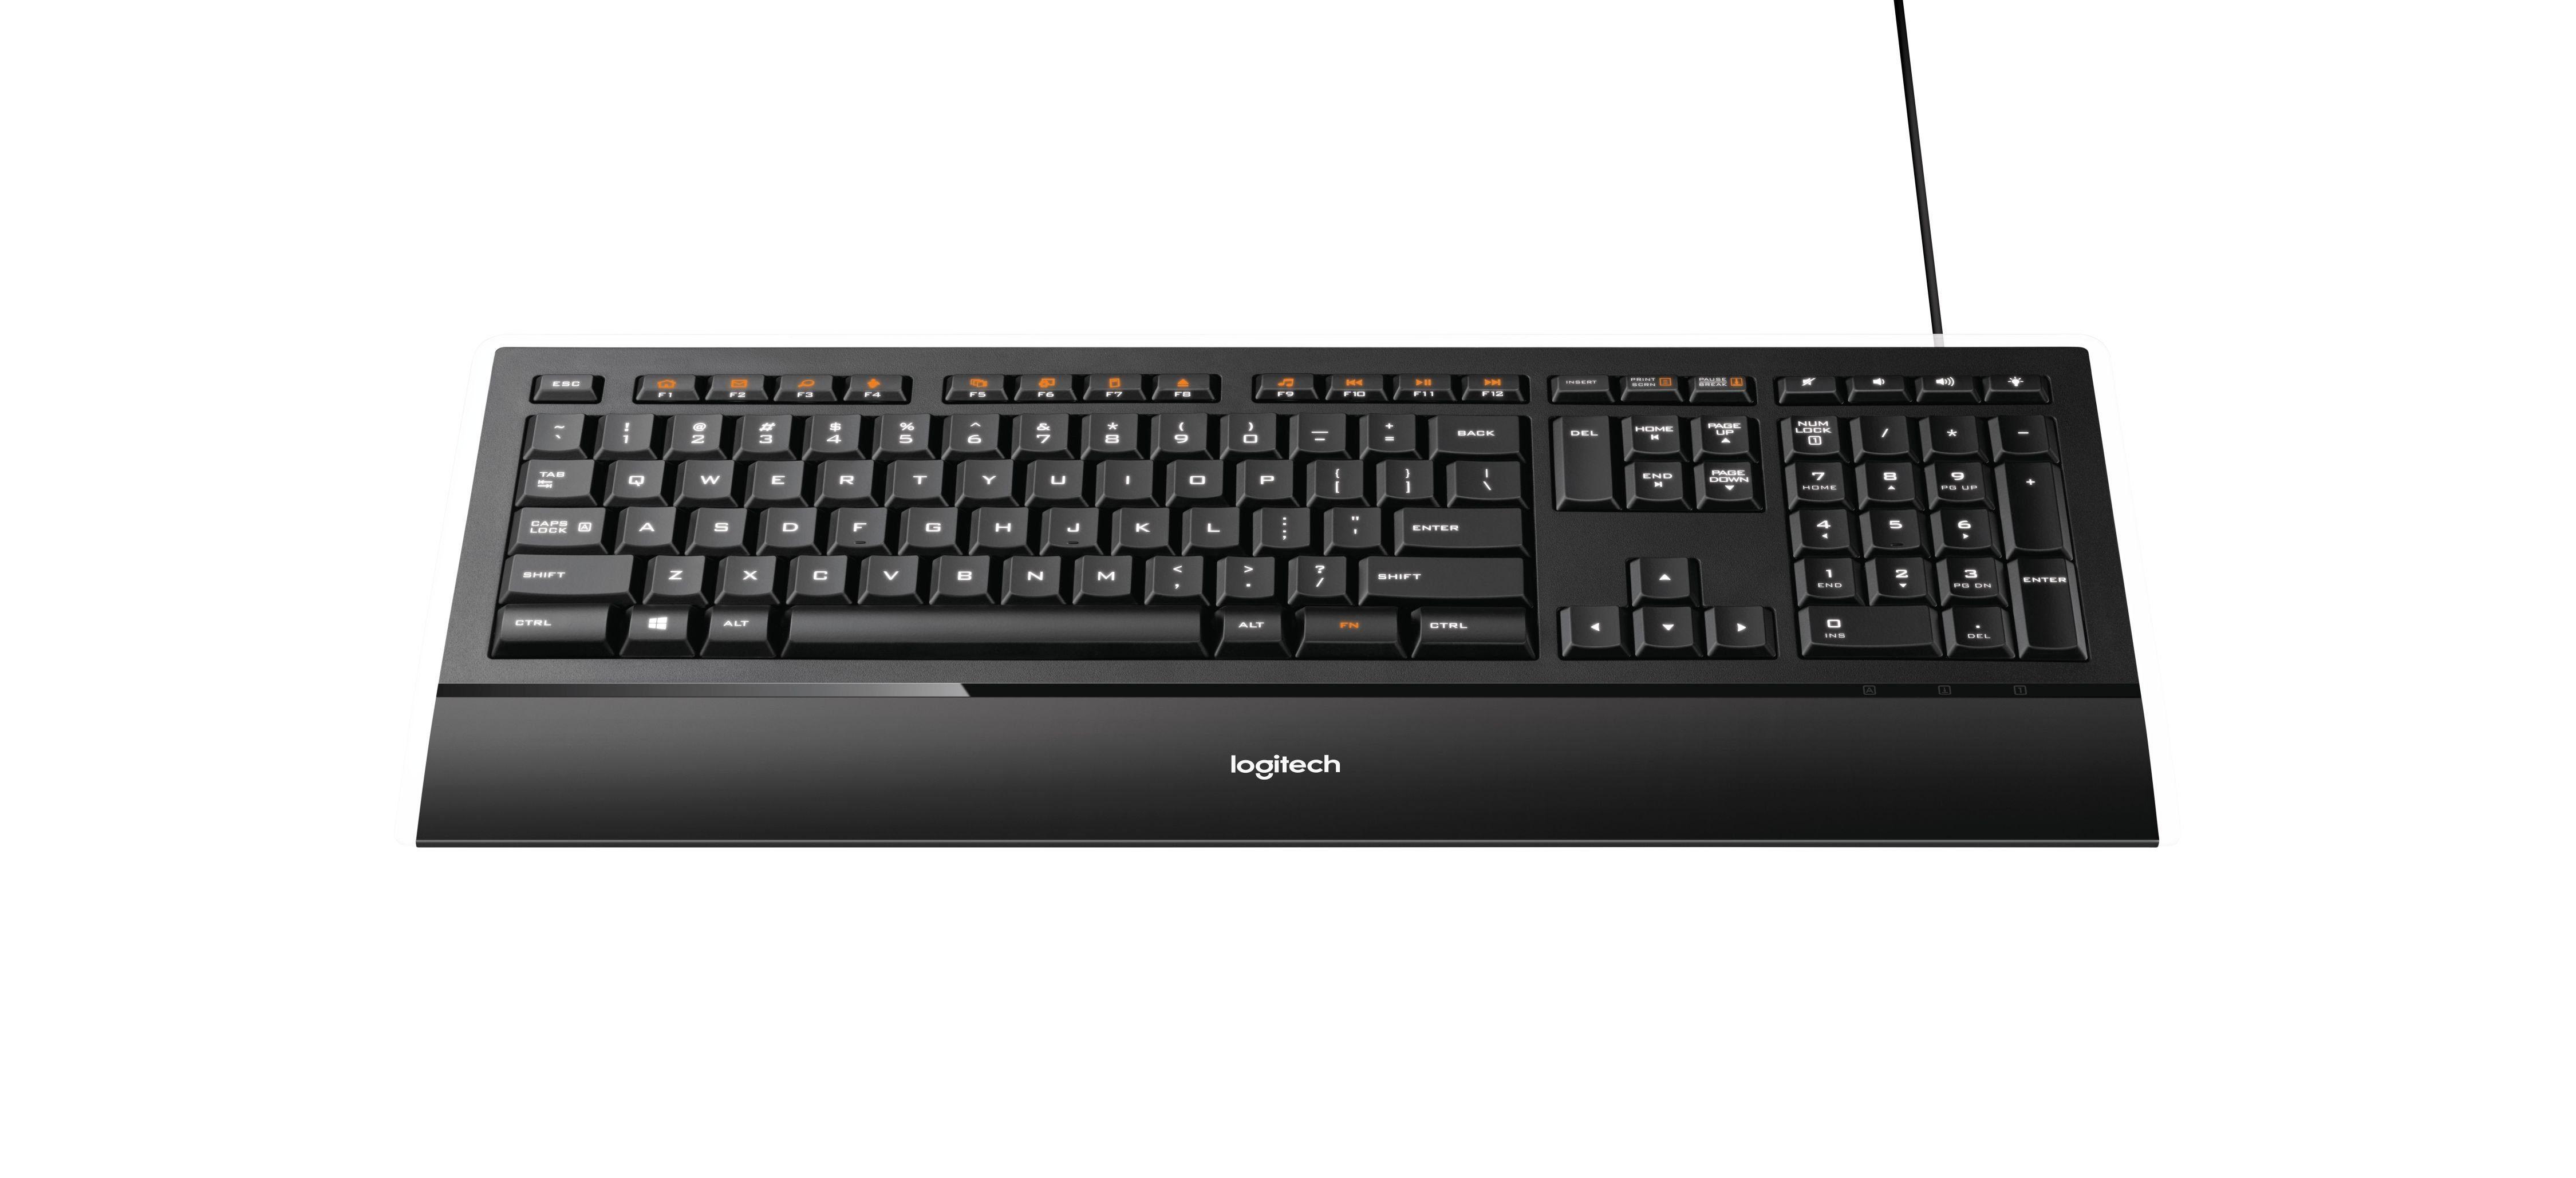 Logitech K740 illumin.Keyboard black USB(DE) »Elegantes Design mit Hintergrundbeleuchtung«